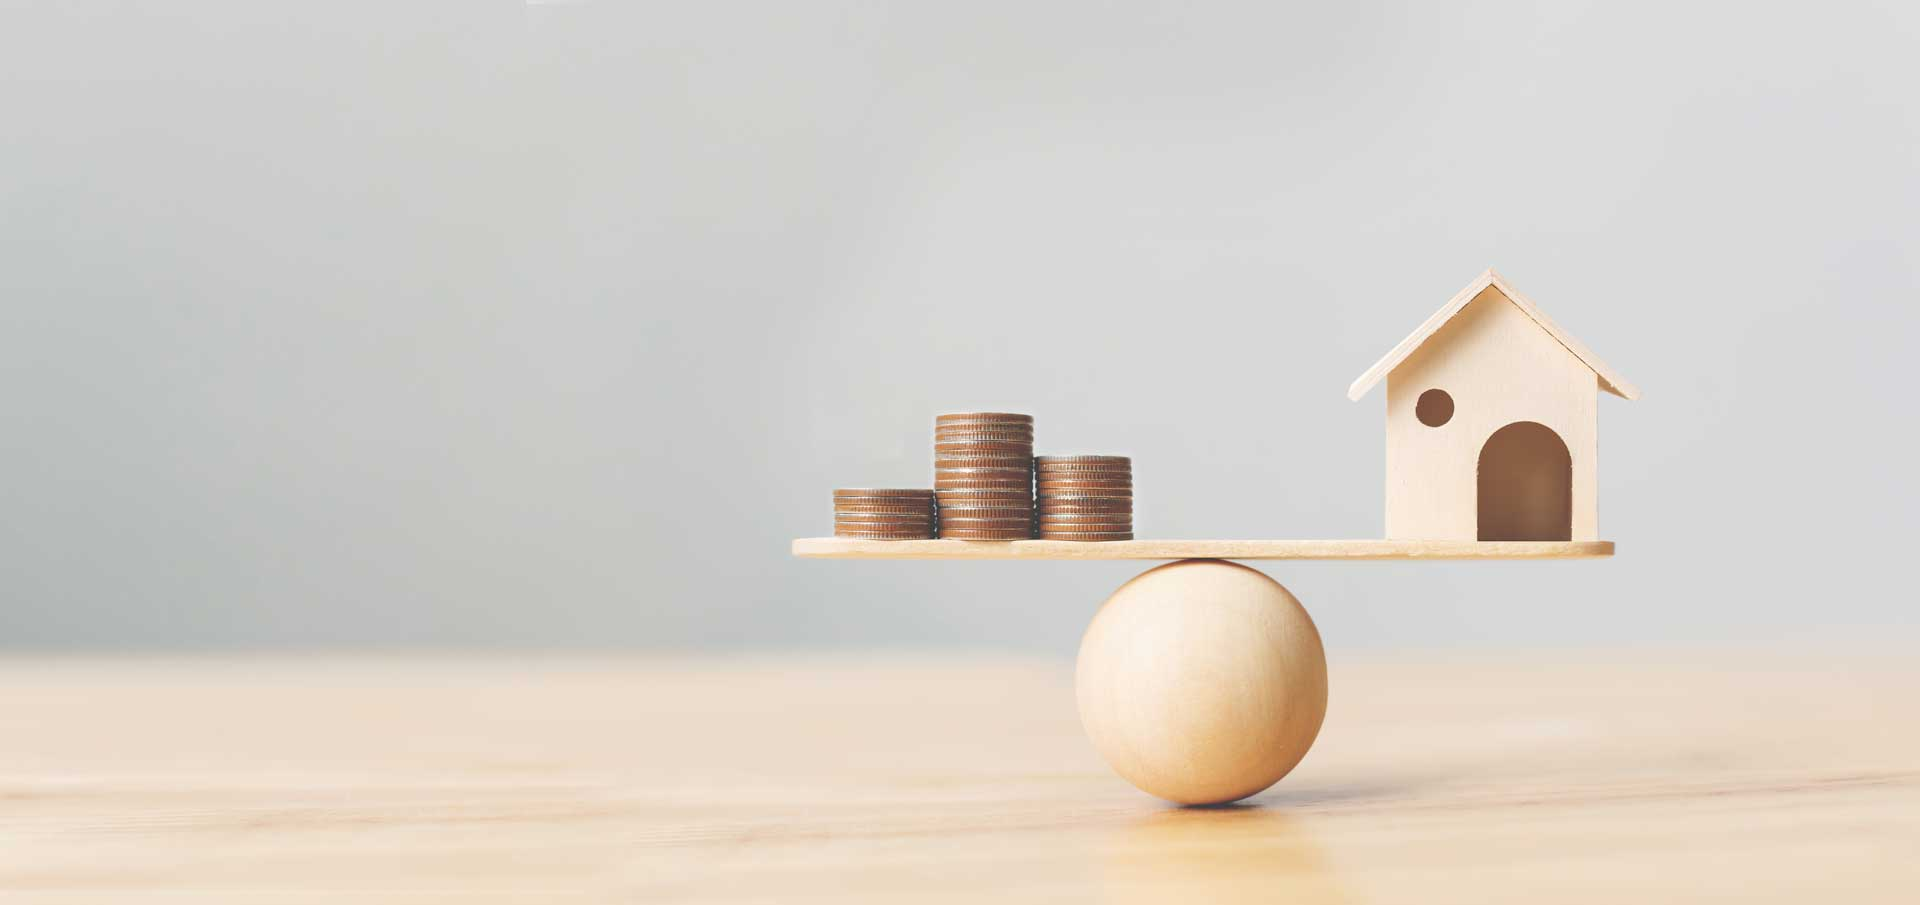 covid-19 balancing money and living